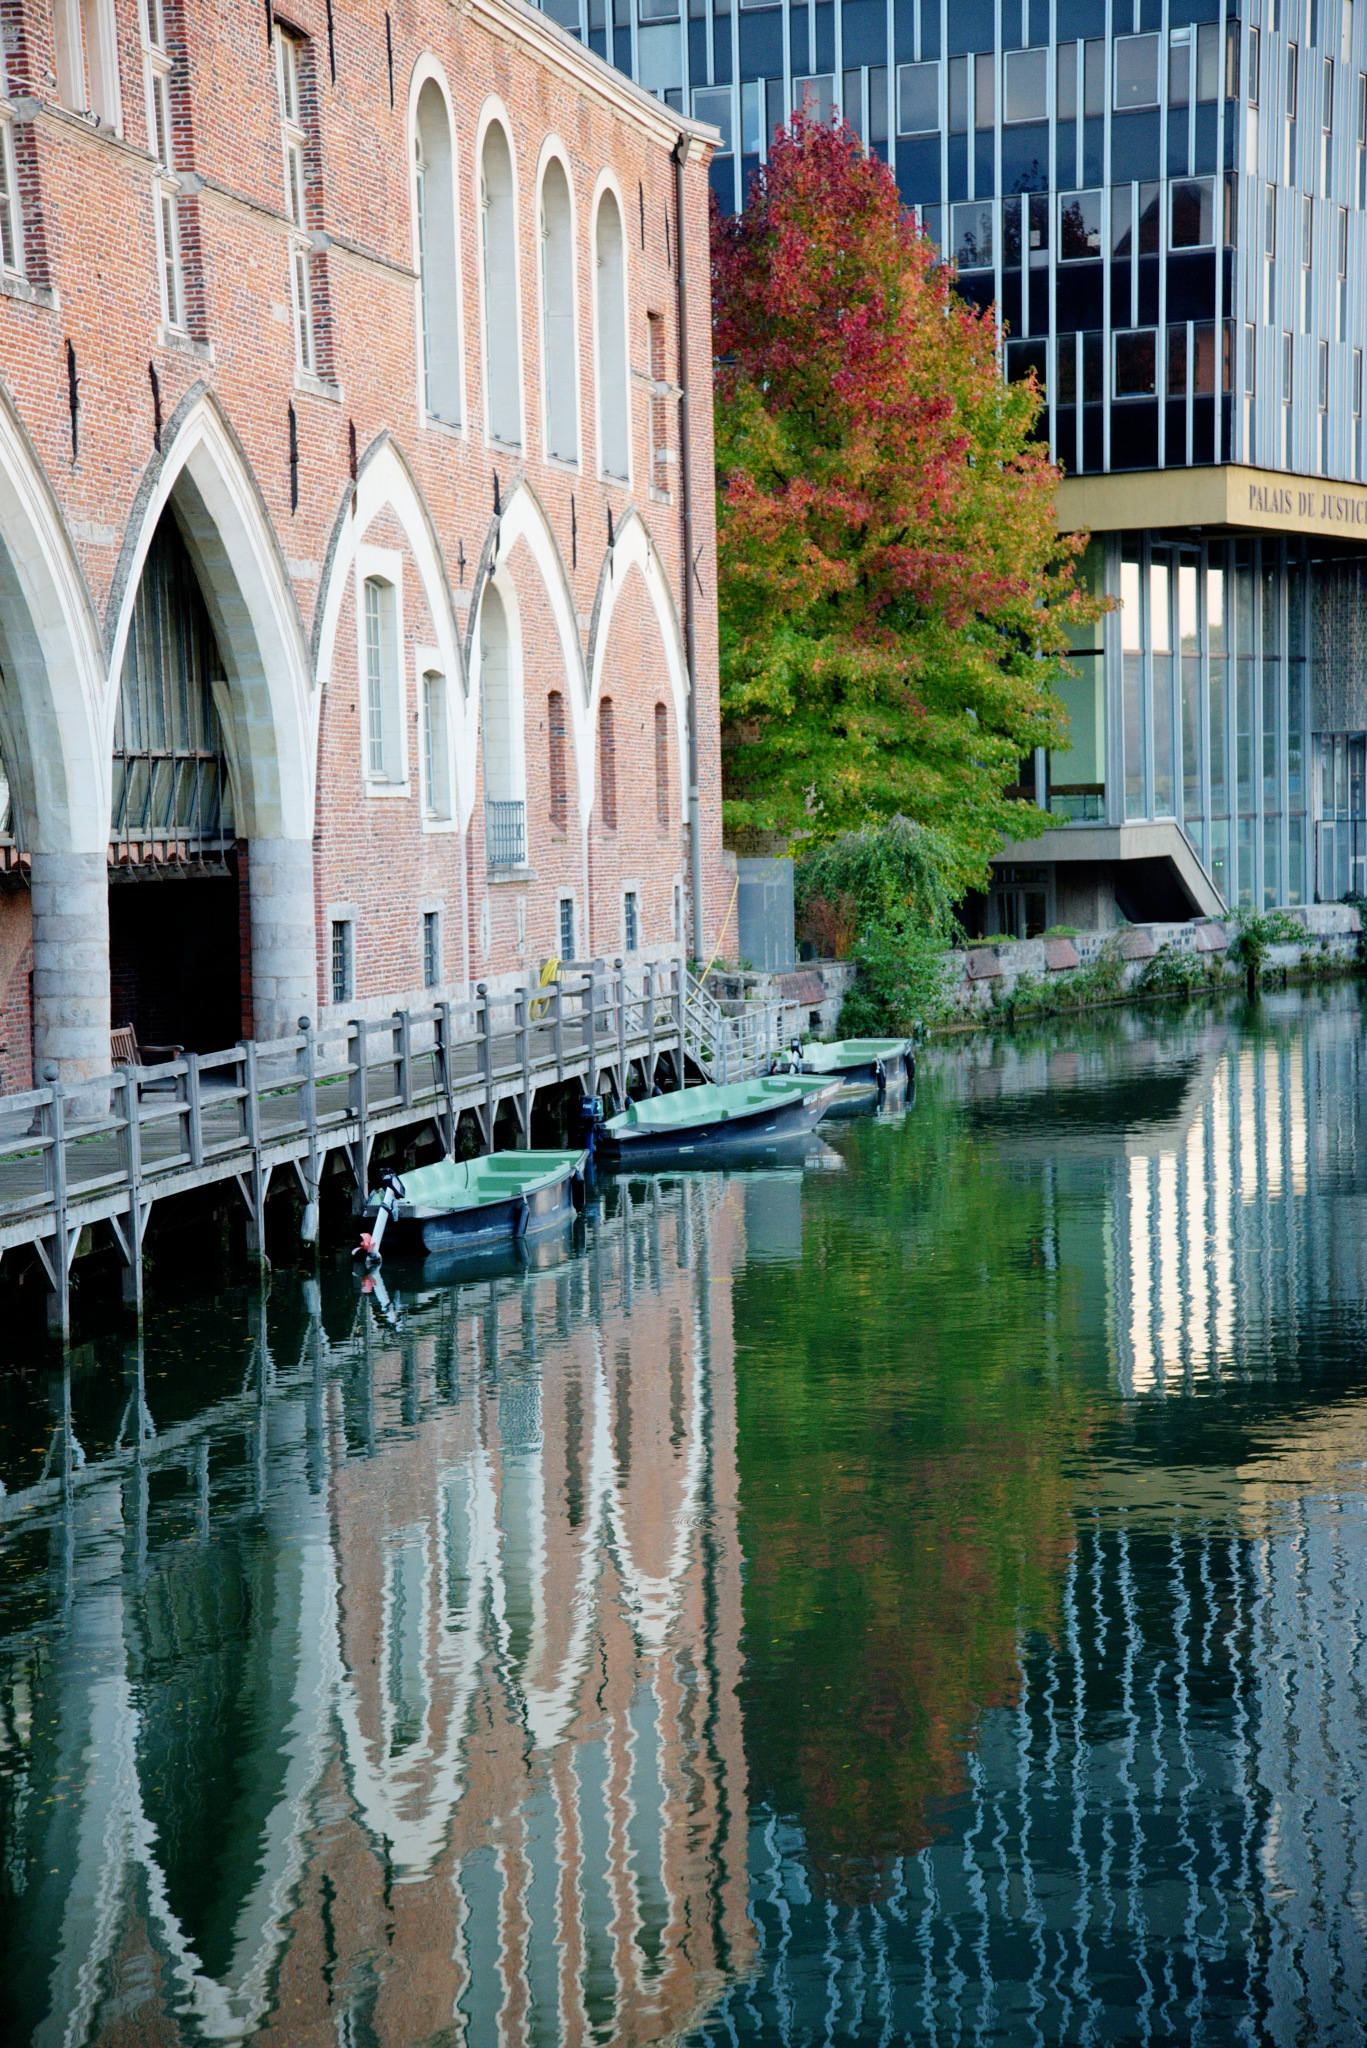 Week end à Douai by bernardf142